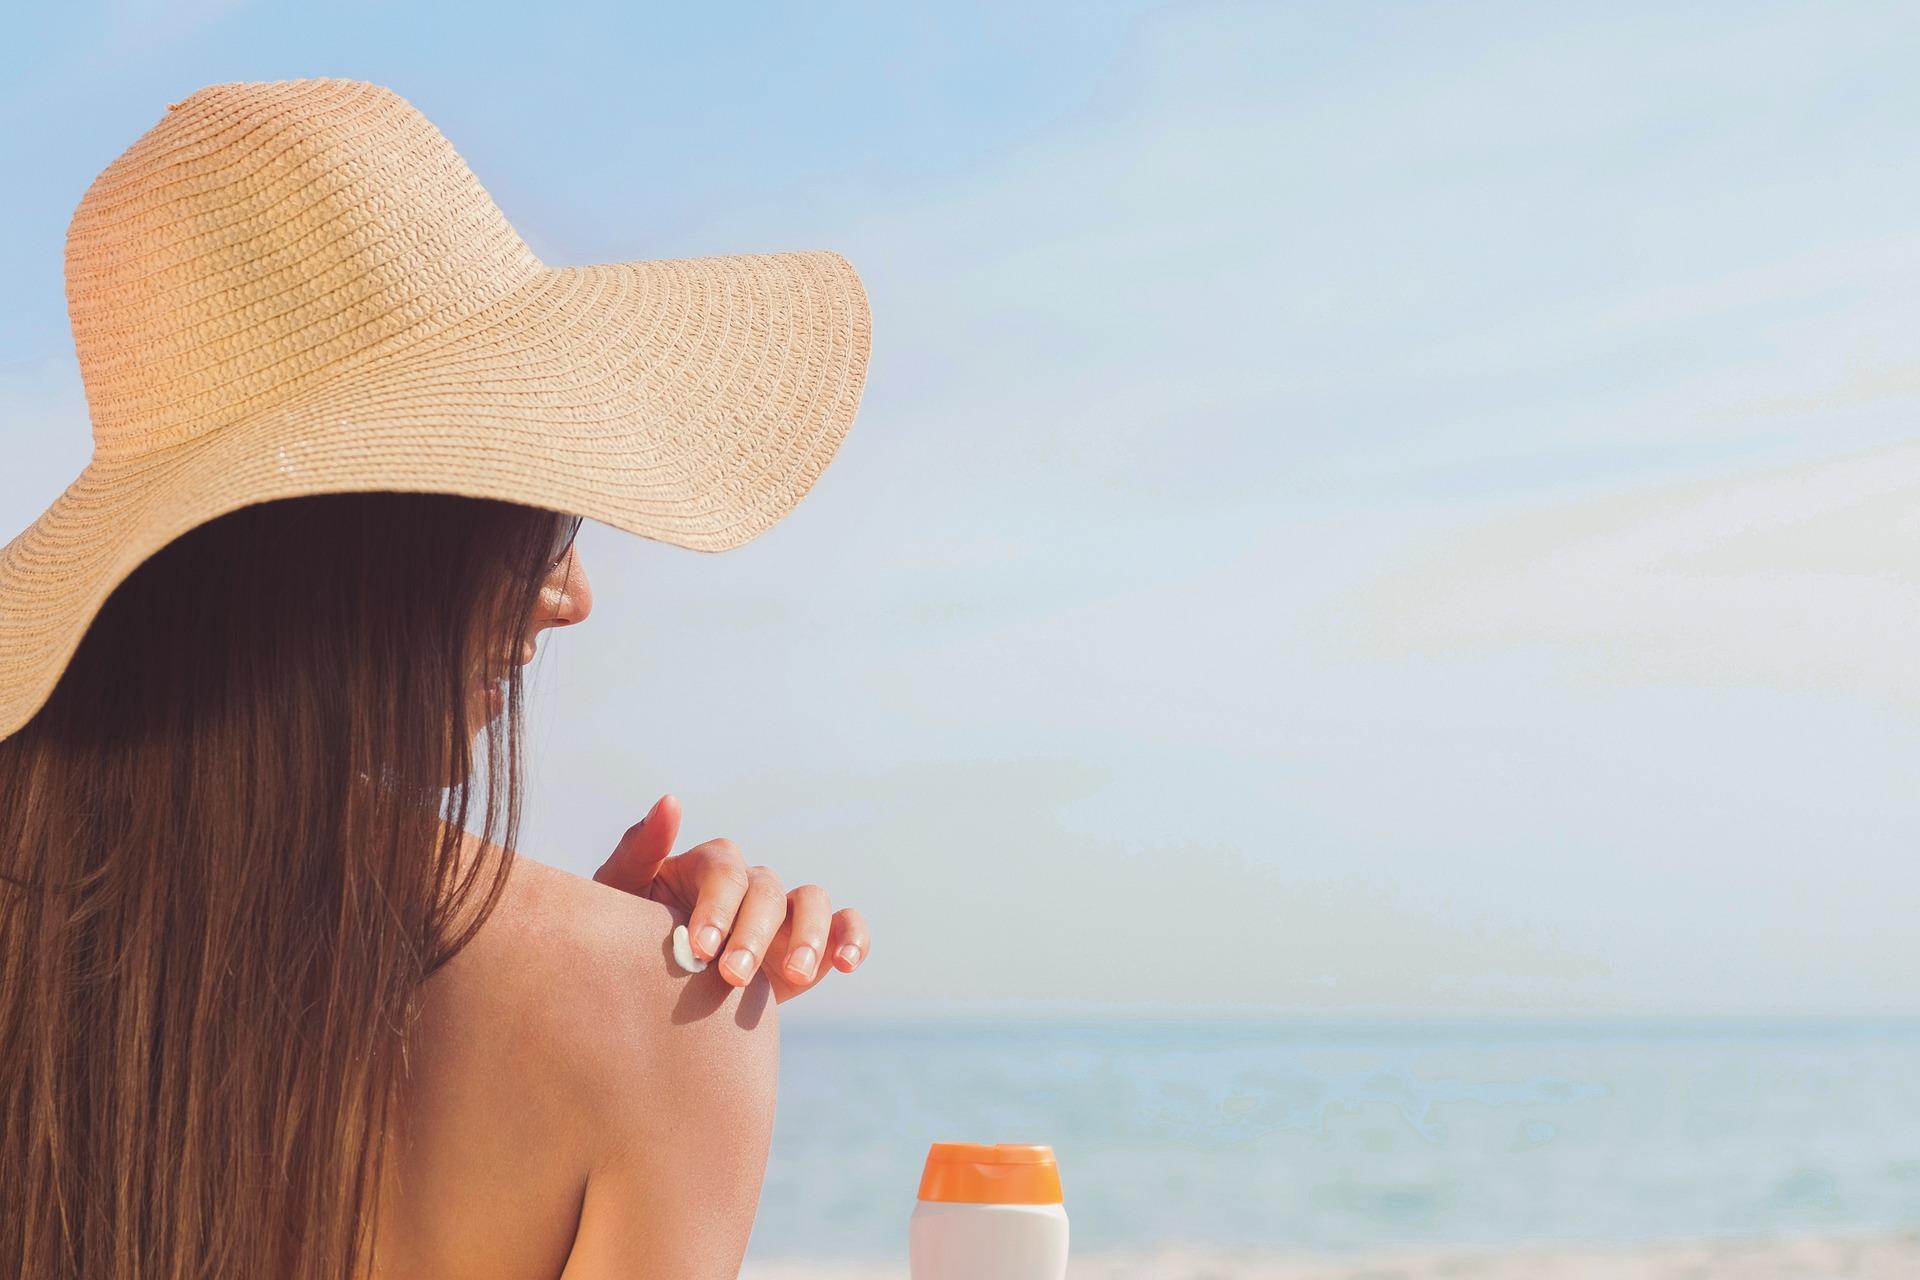 Studi: Penggunaan sunscreen dapat menjaga fungsi pembuluh darah